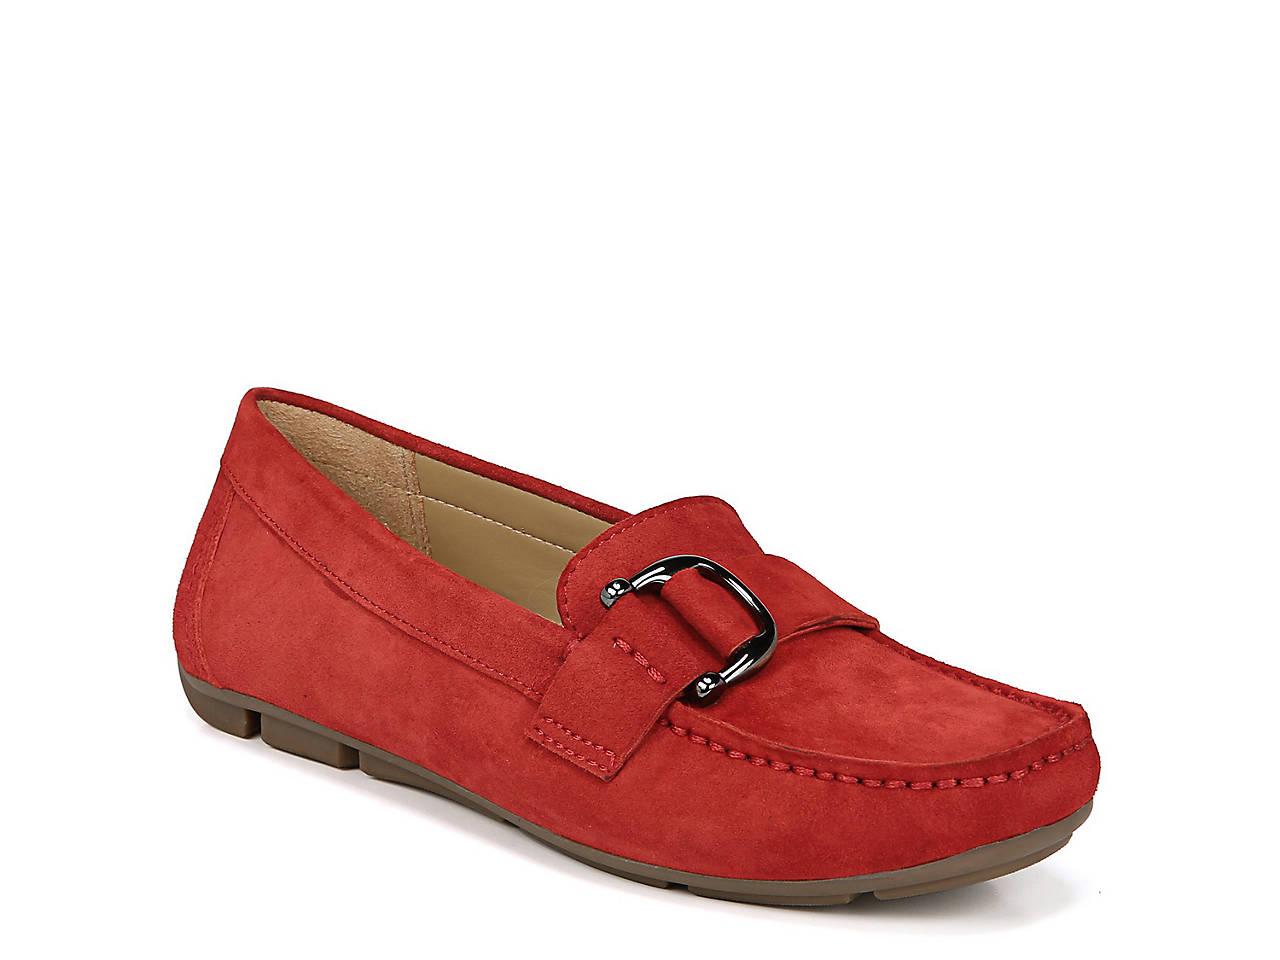 10655fab869 Naturalizer Berkley Loafer Women s Shoes